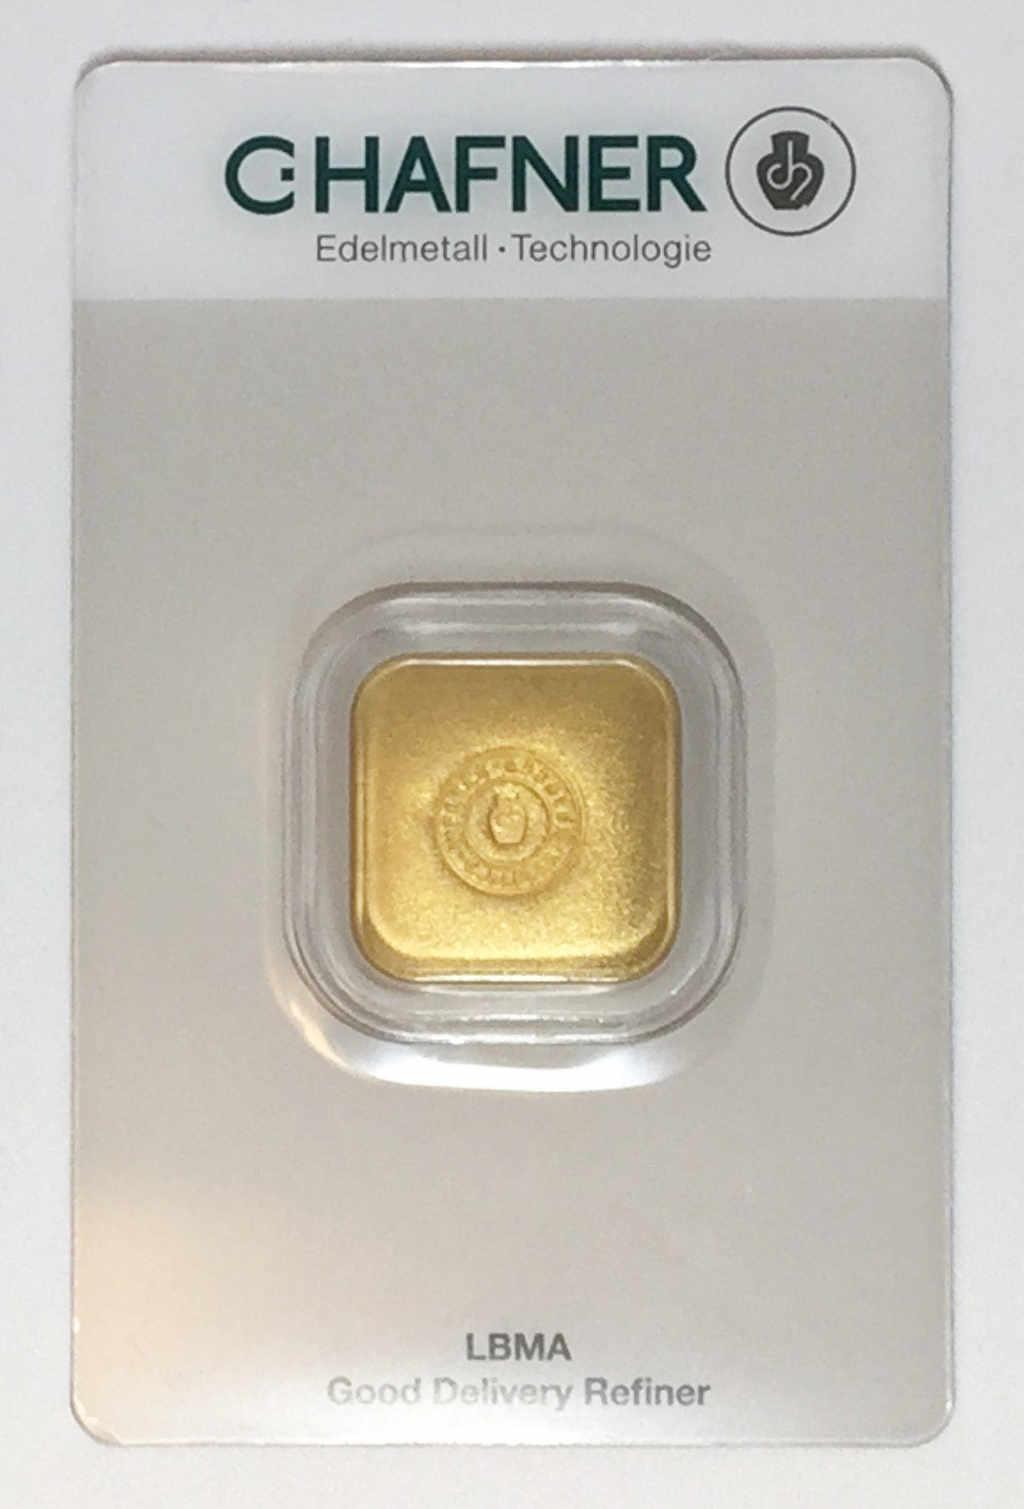 goldbarren 50g hafner feingold 9999 gussbarren aurum edelmetallshop. Black Bedroom Furniture Sets. Home Design Ideas